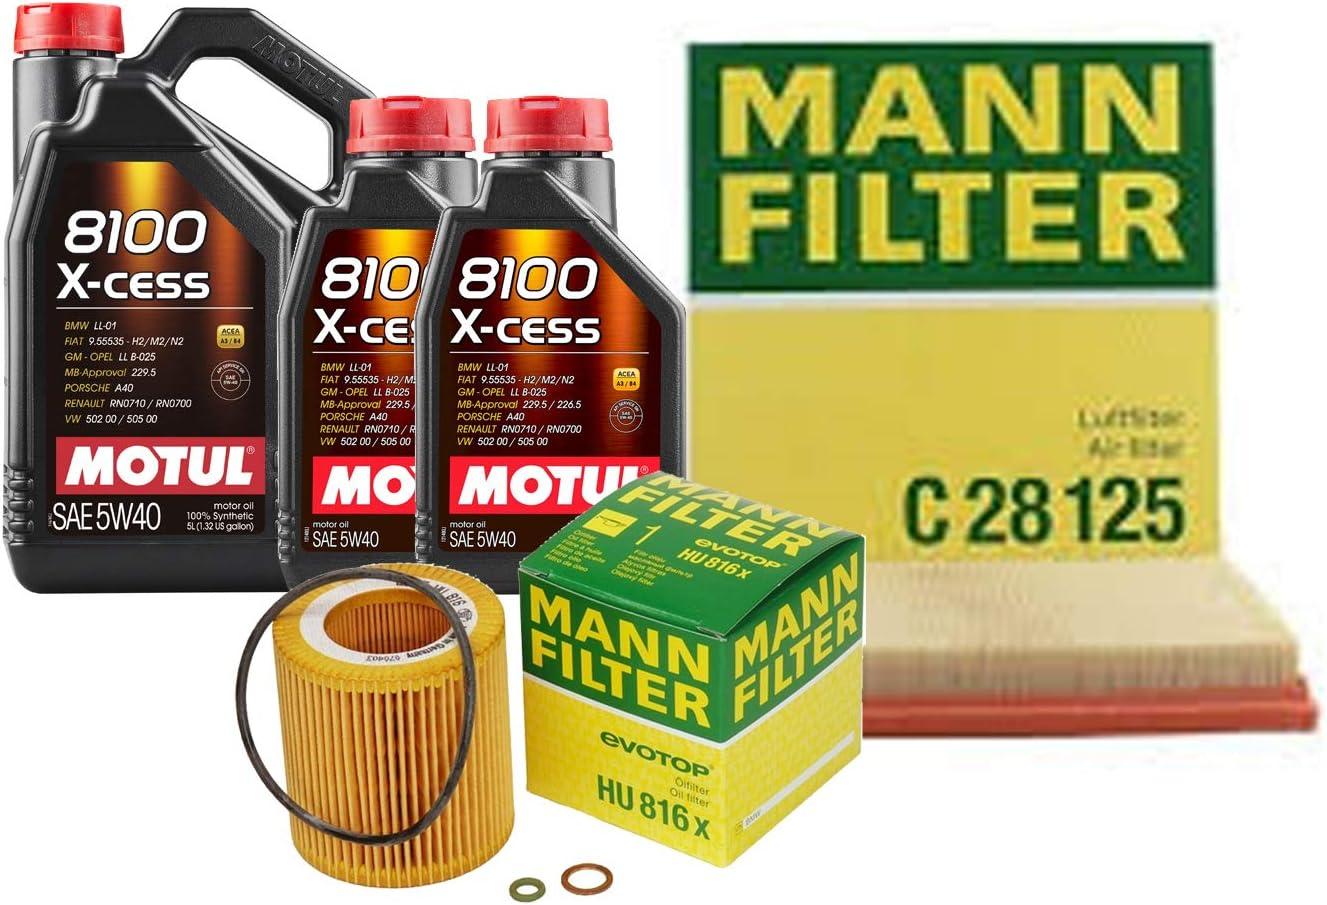 Newparts 7L 8100 XCESS security 5W40 Max 60% OFF Filter Motor s Oil Change F16 Kit X6